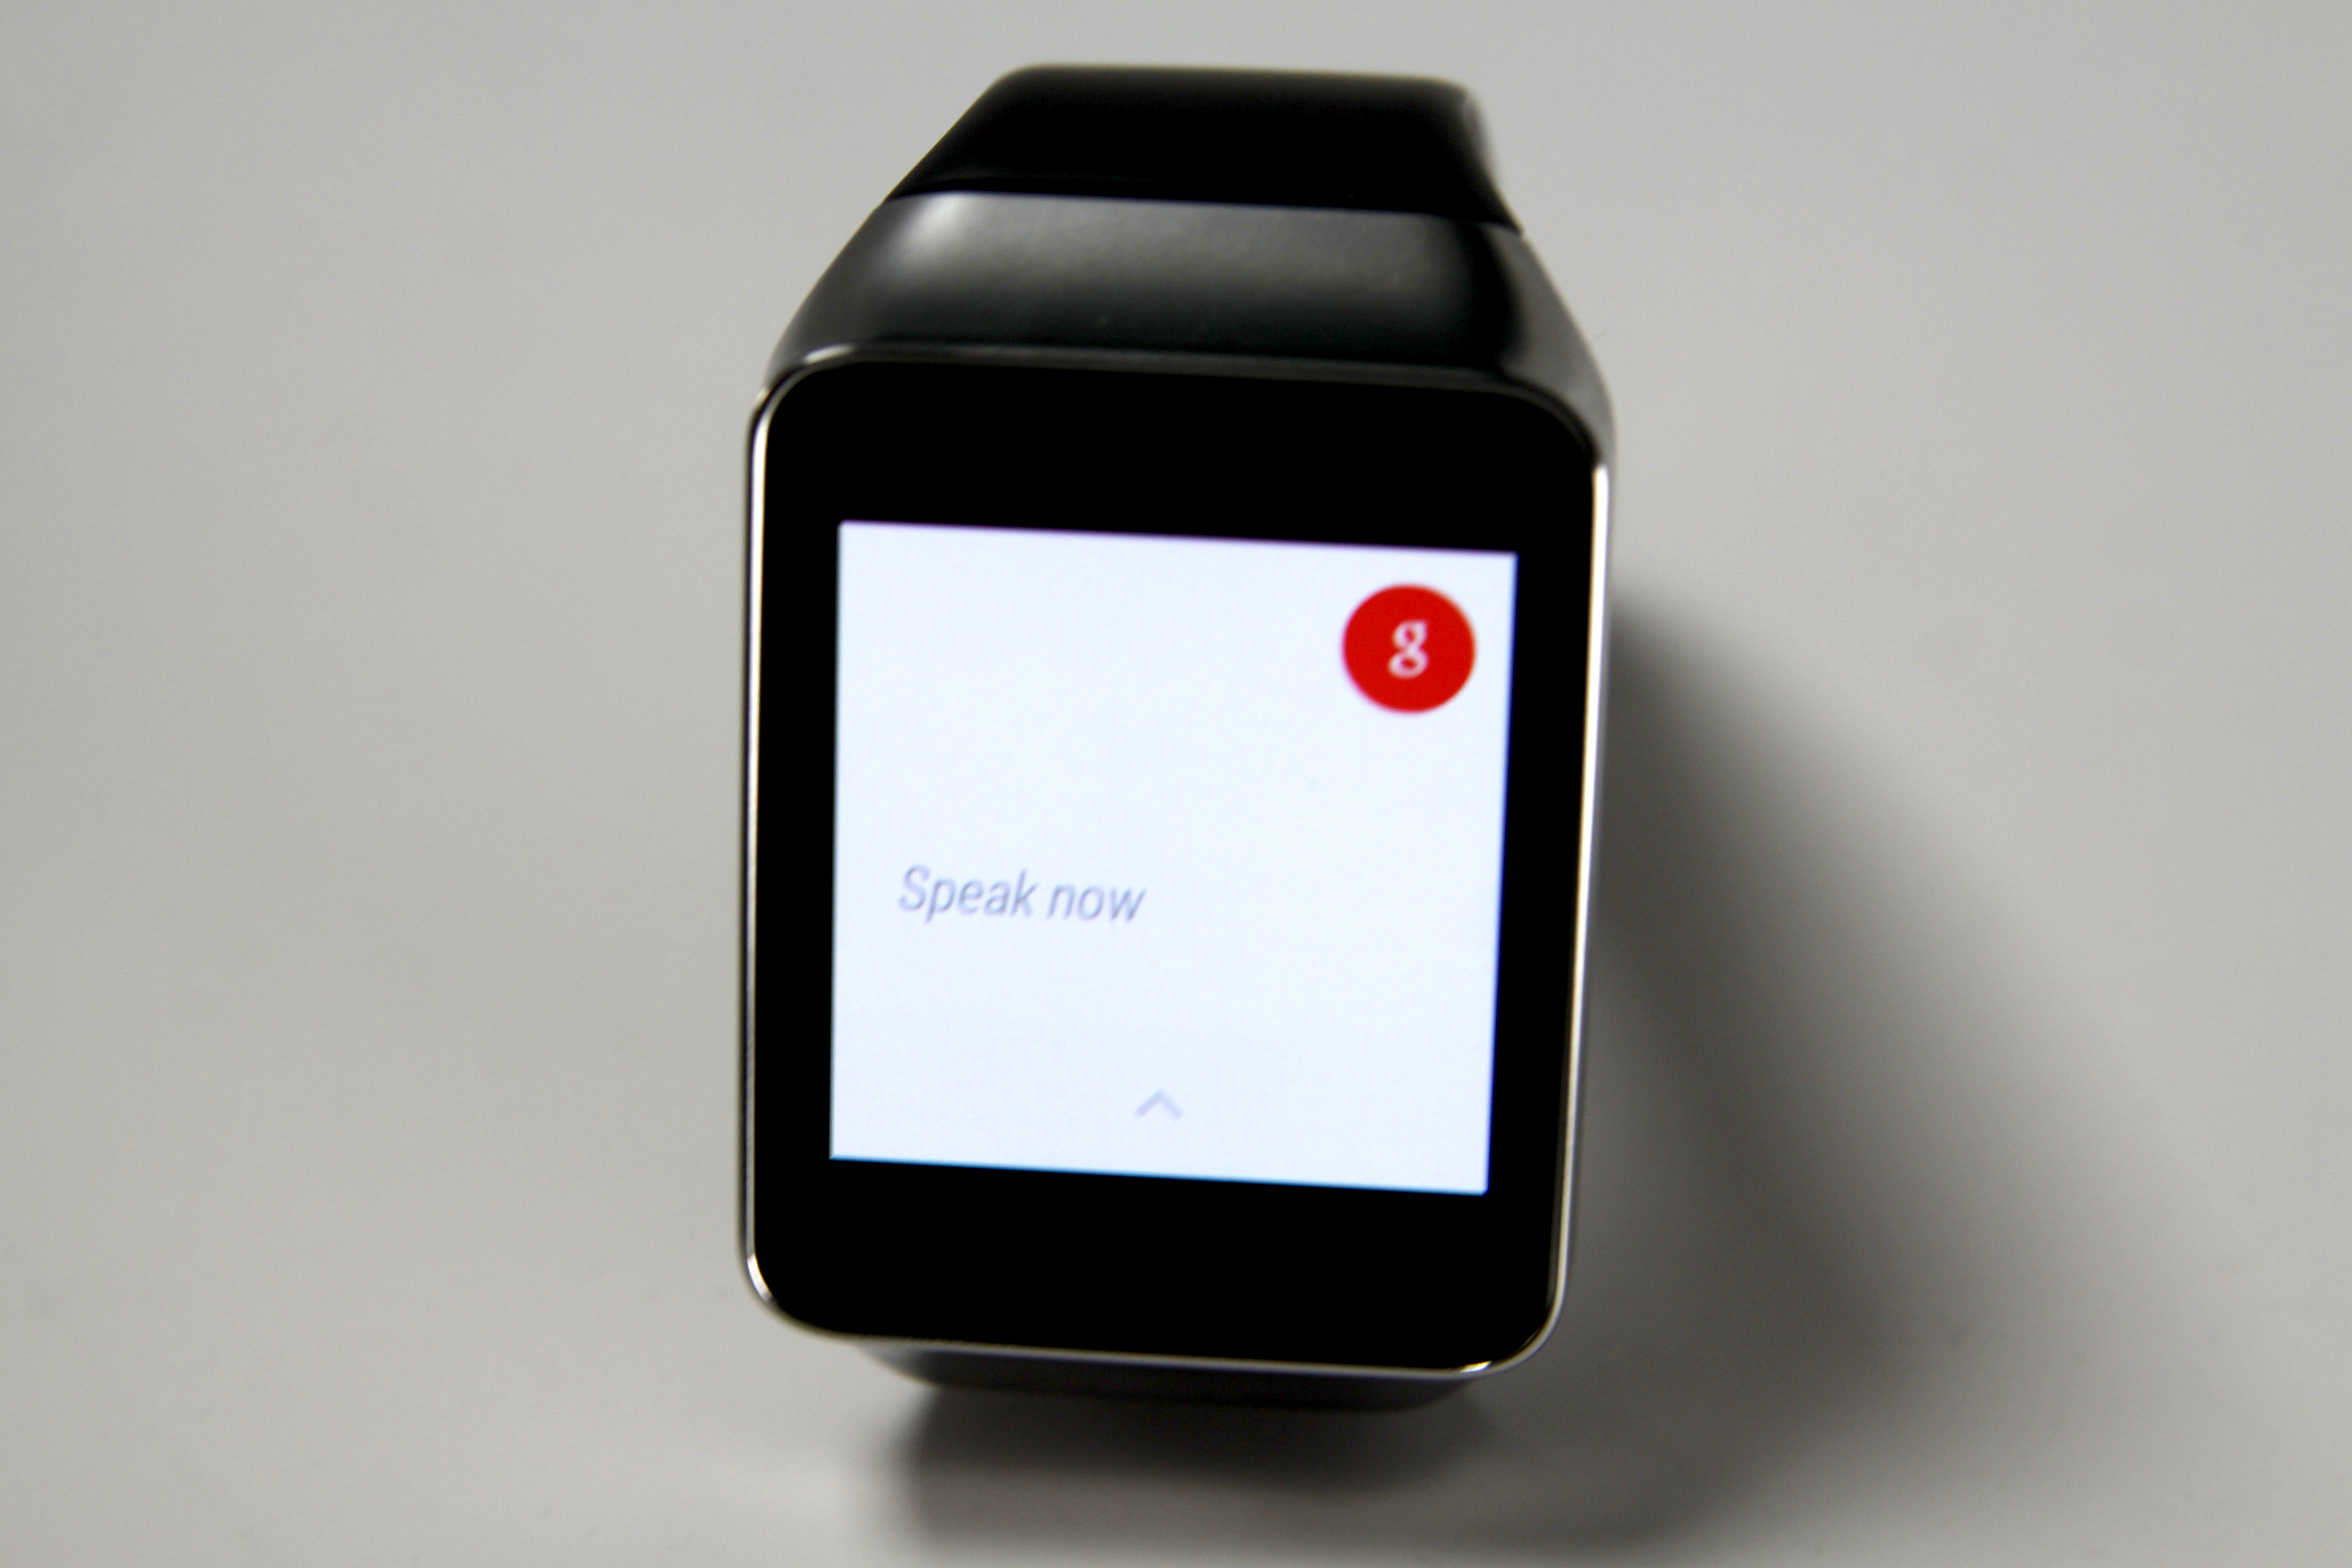 Samsung-gear-Live-main-menu-01